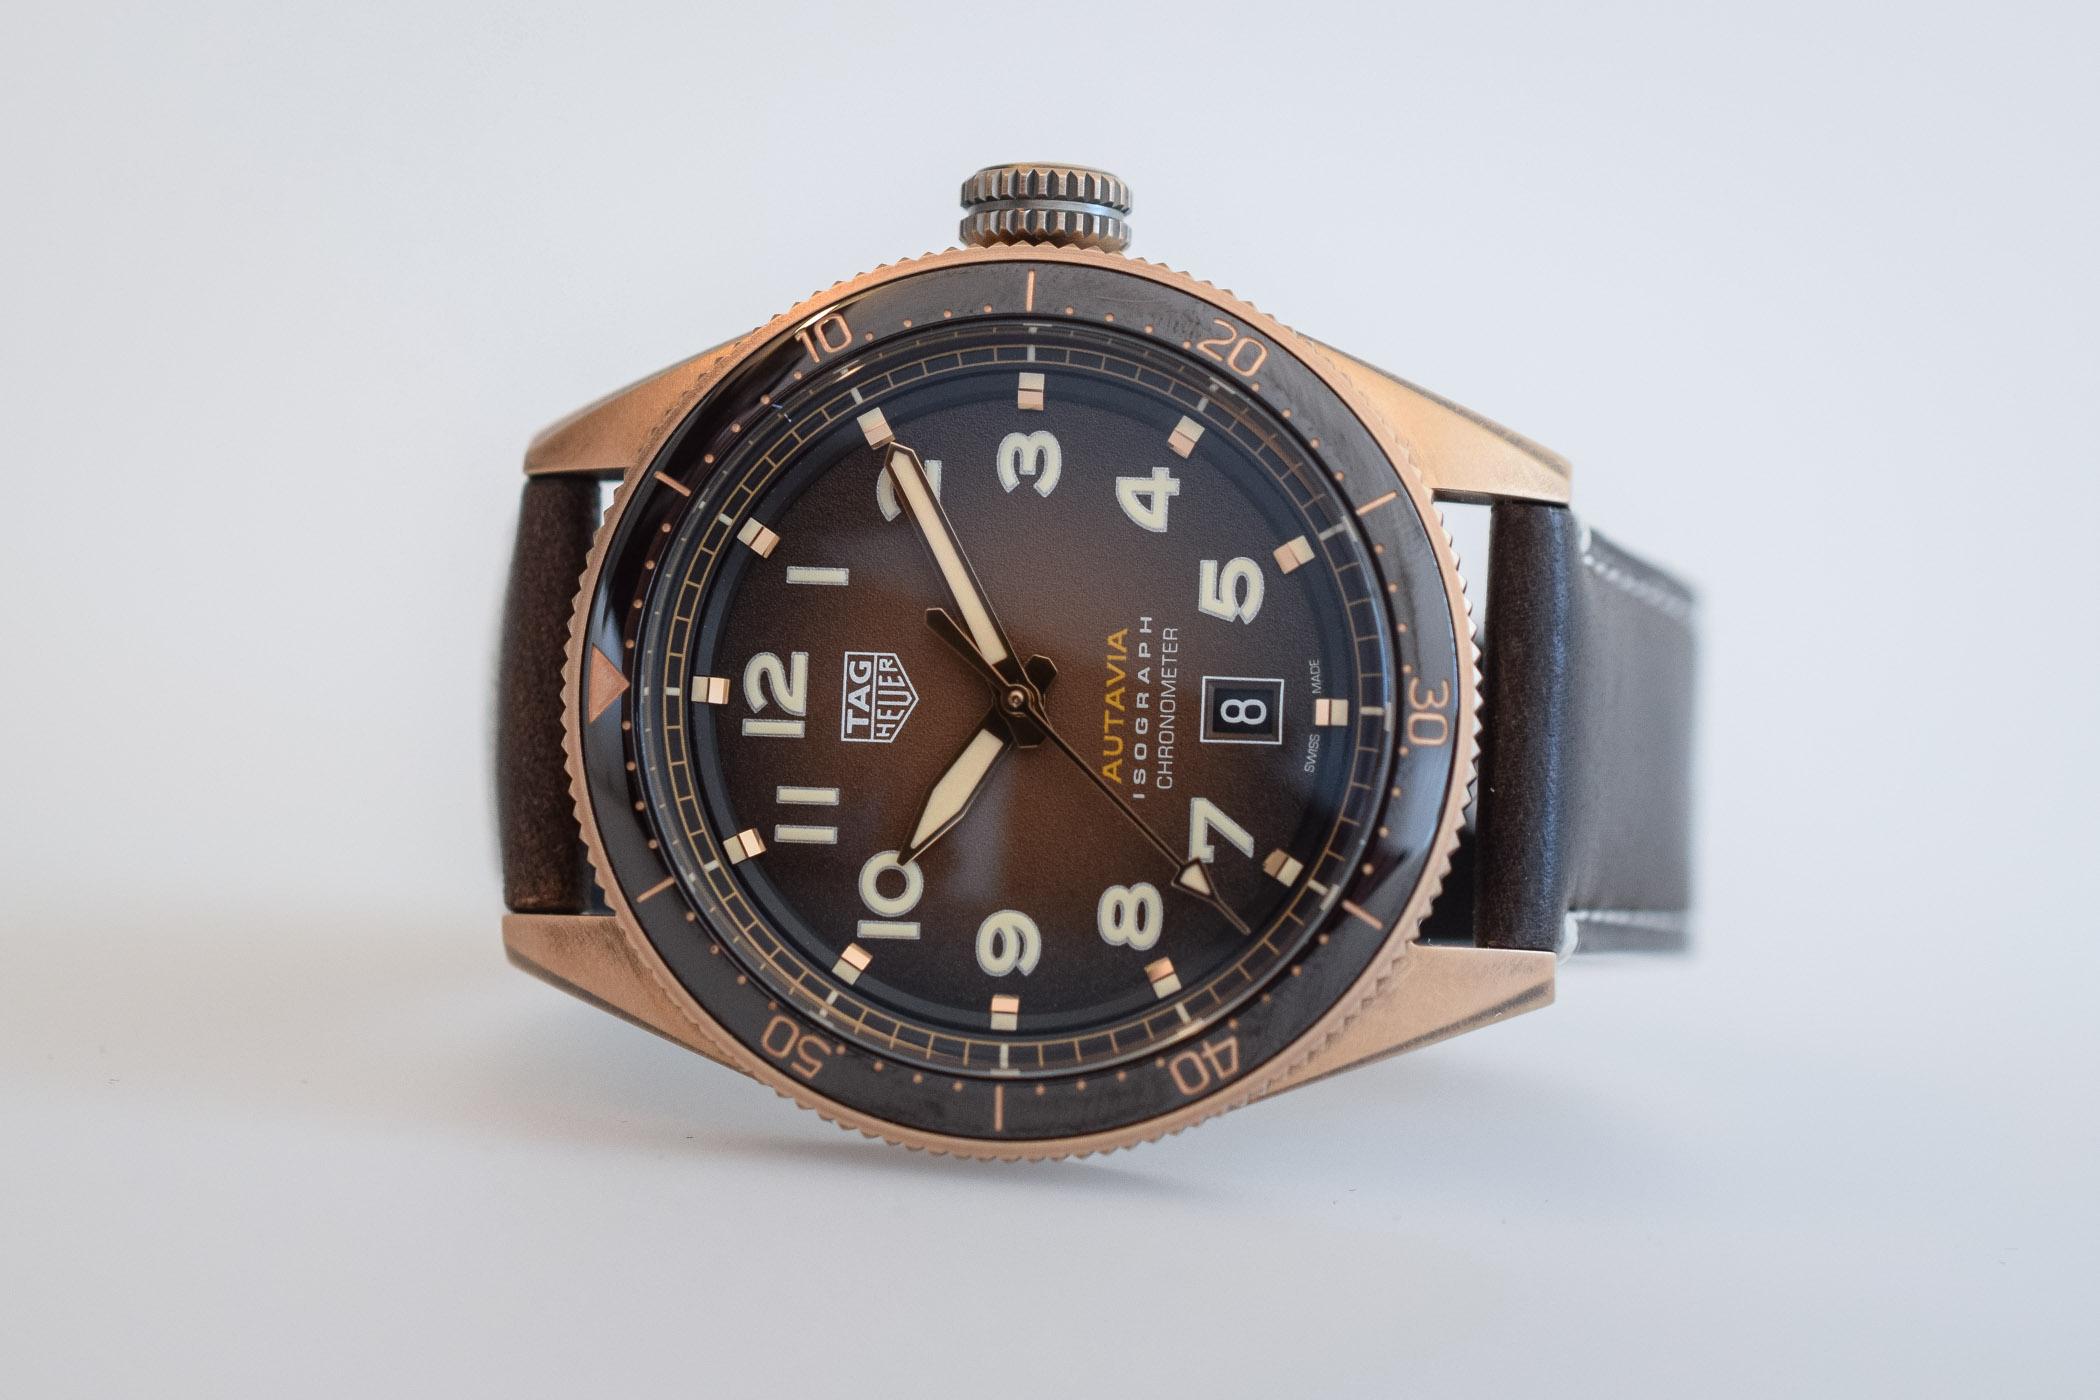 TAG Heuer Autavia Isograph Chronometer - Baselworld 2019 - 1